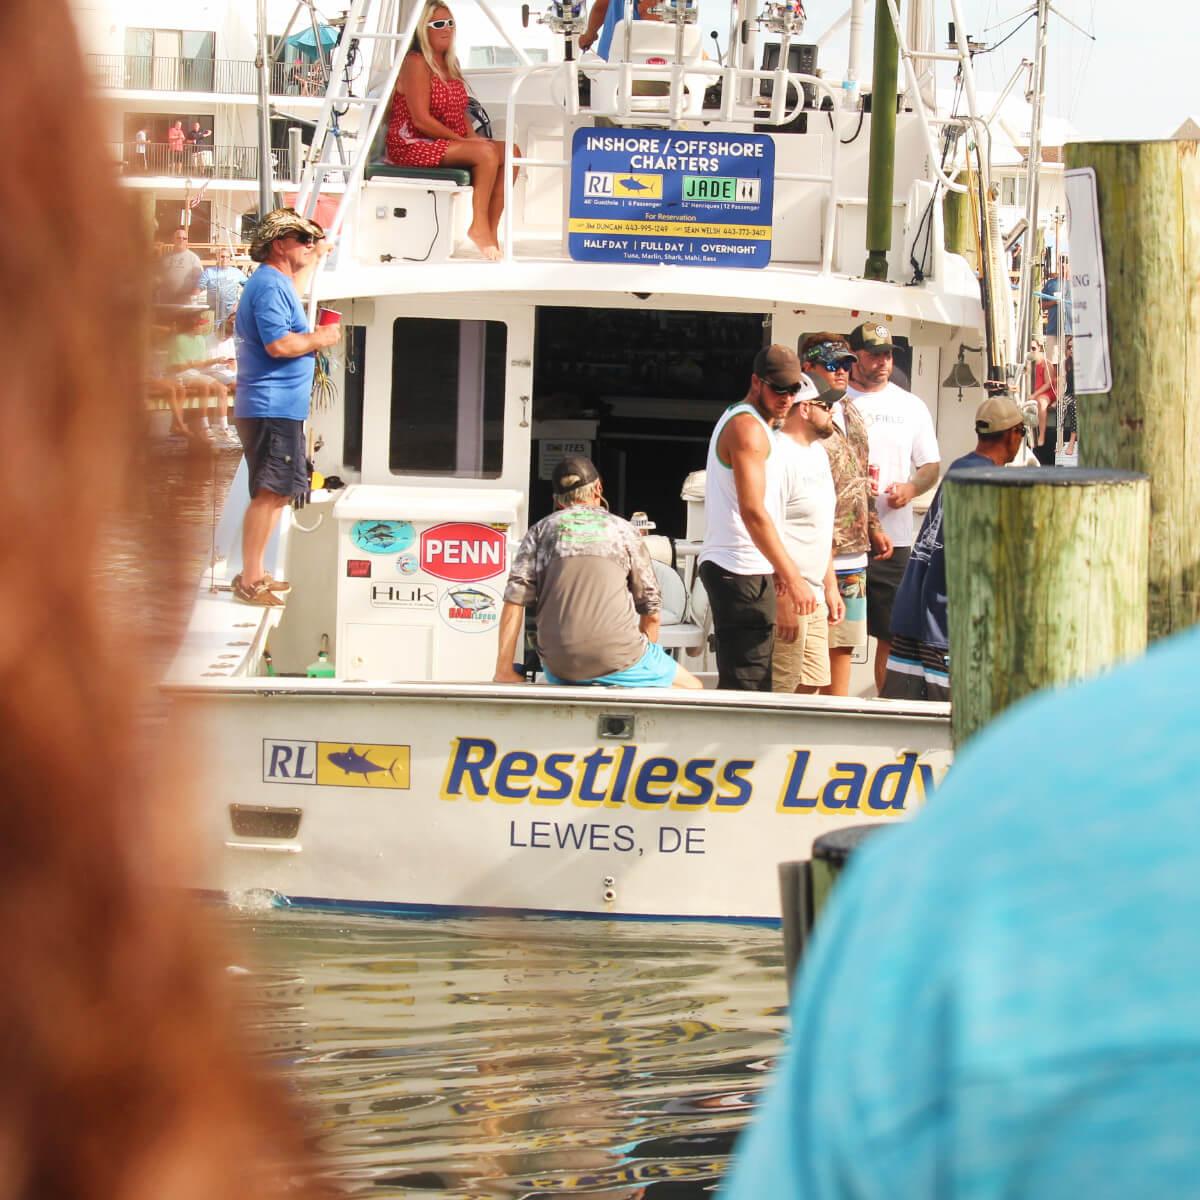 Restless lady boat